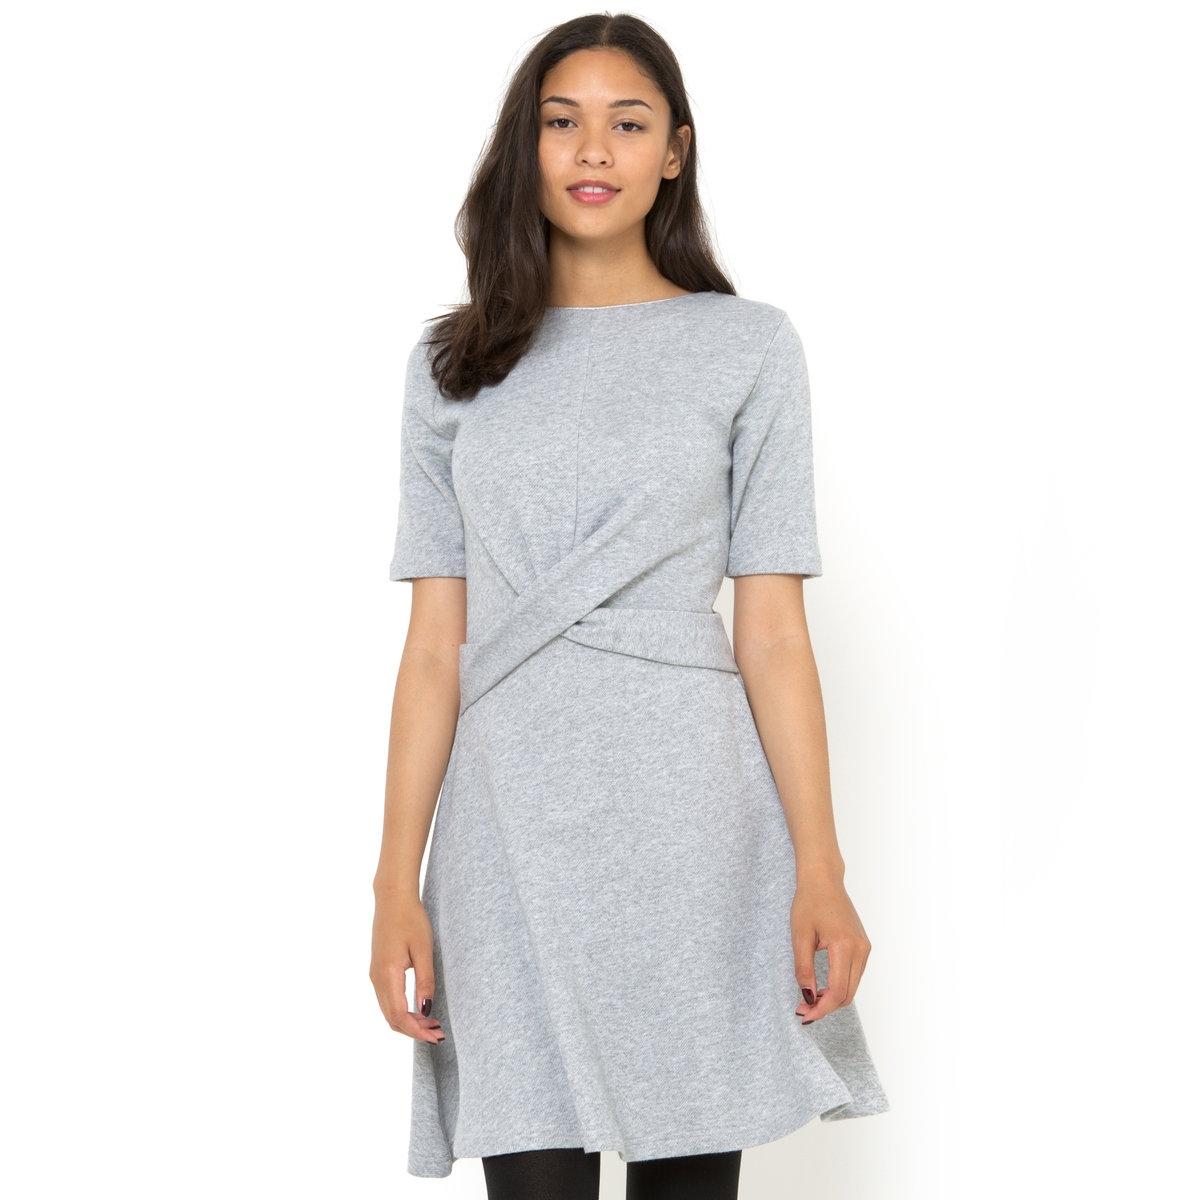 ПлатьеПлатье PEPE JEANS. 60% хлопка, 40% полиэстера. Короткие рукава.<br><br>Цвет: серый меланж<br>Размер: M